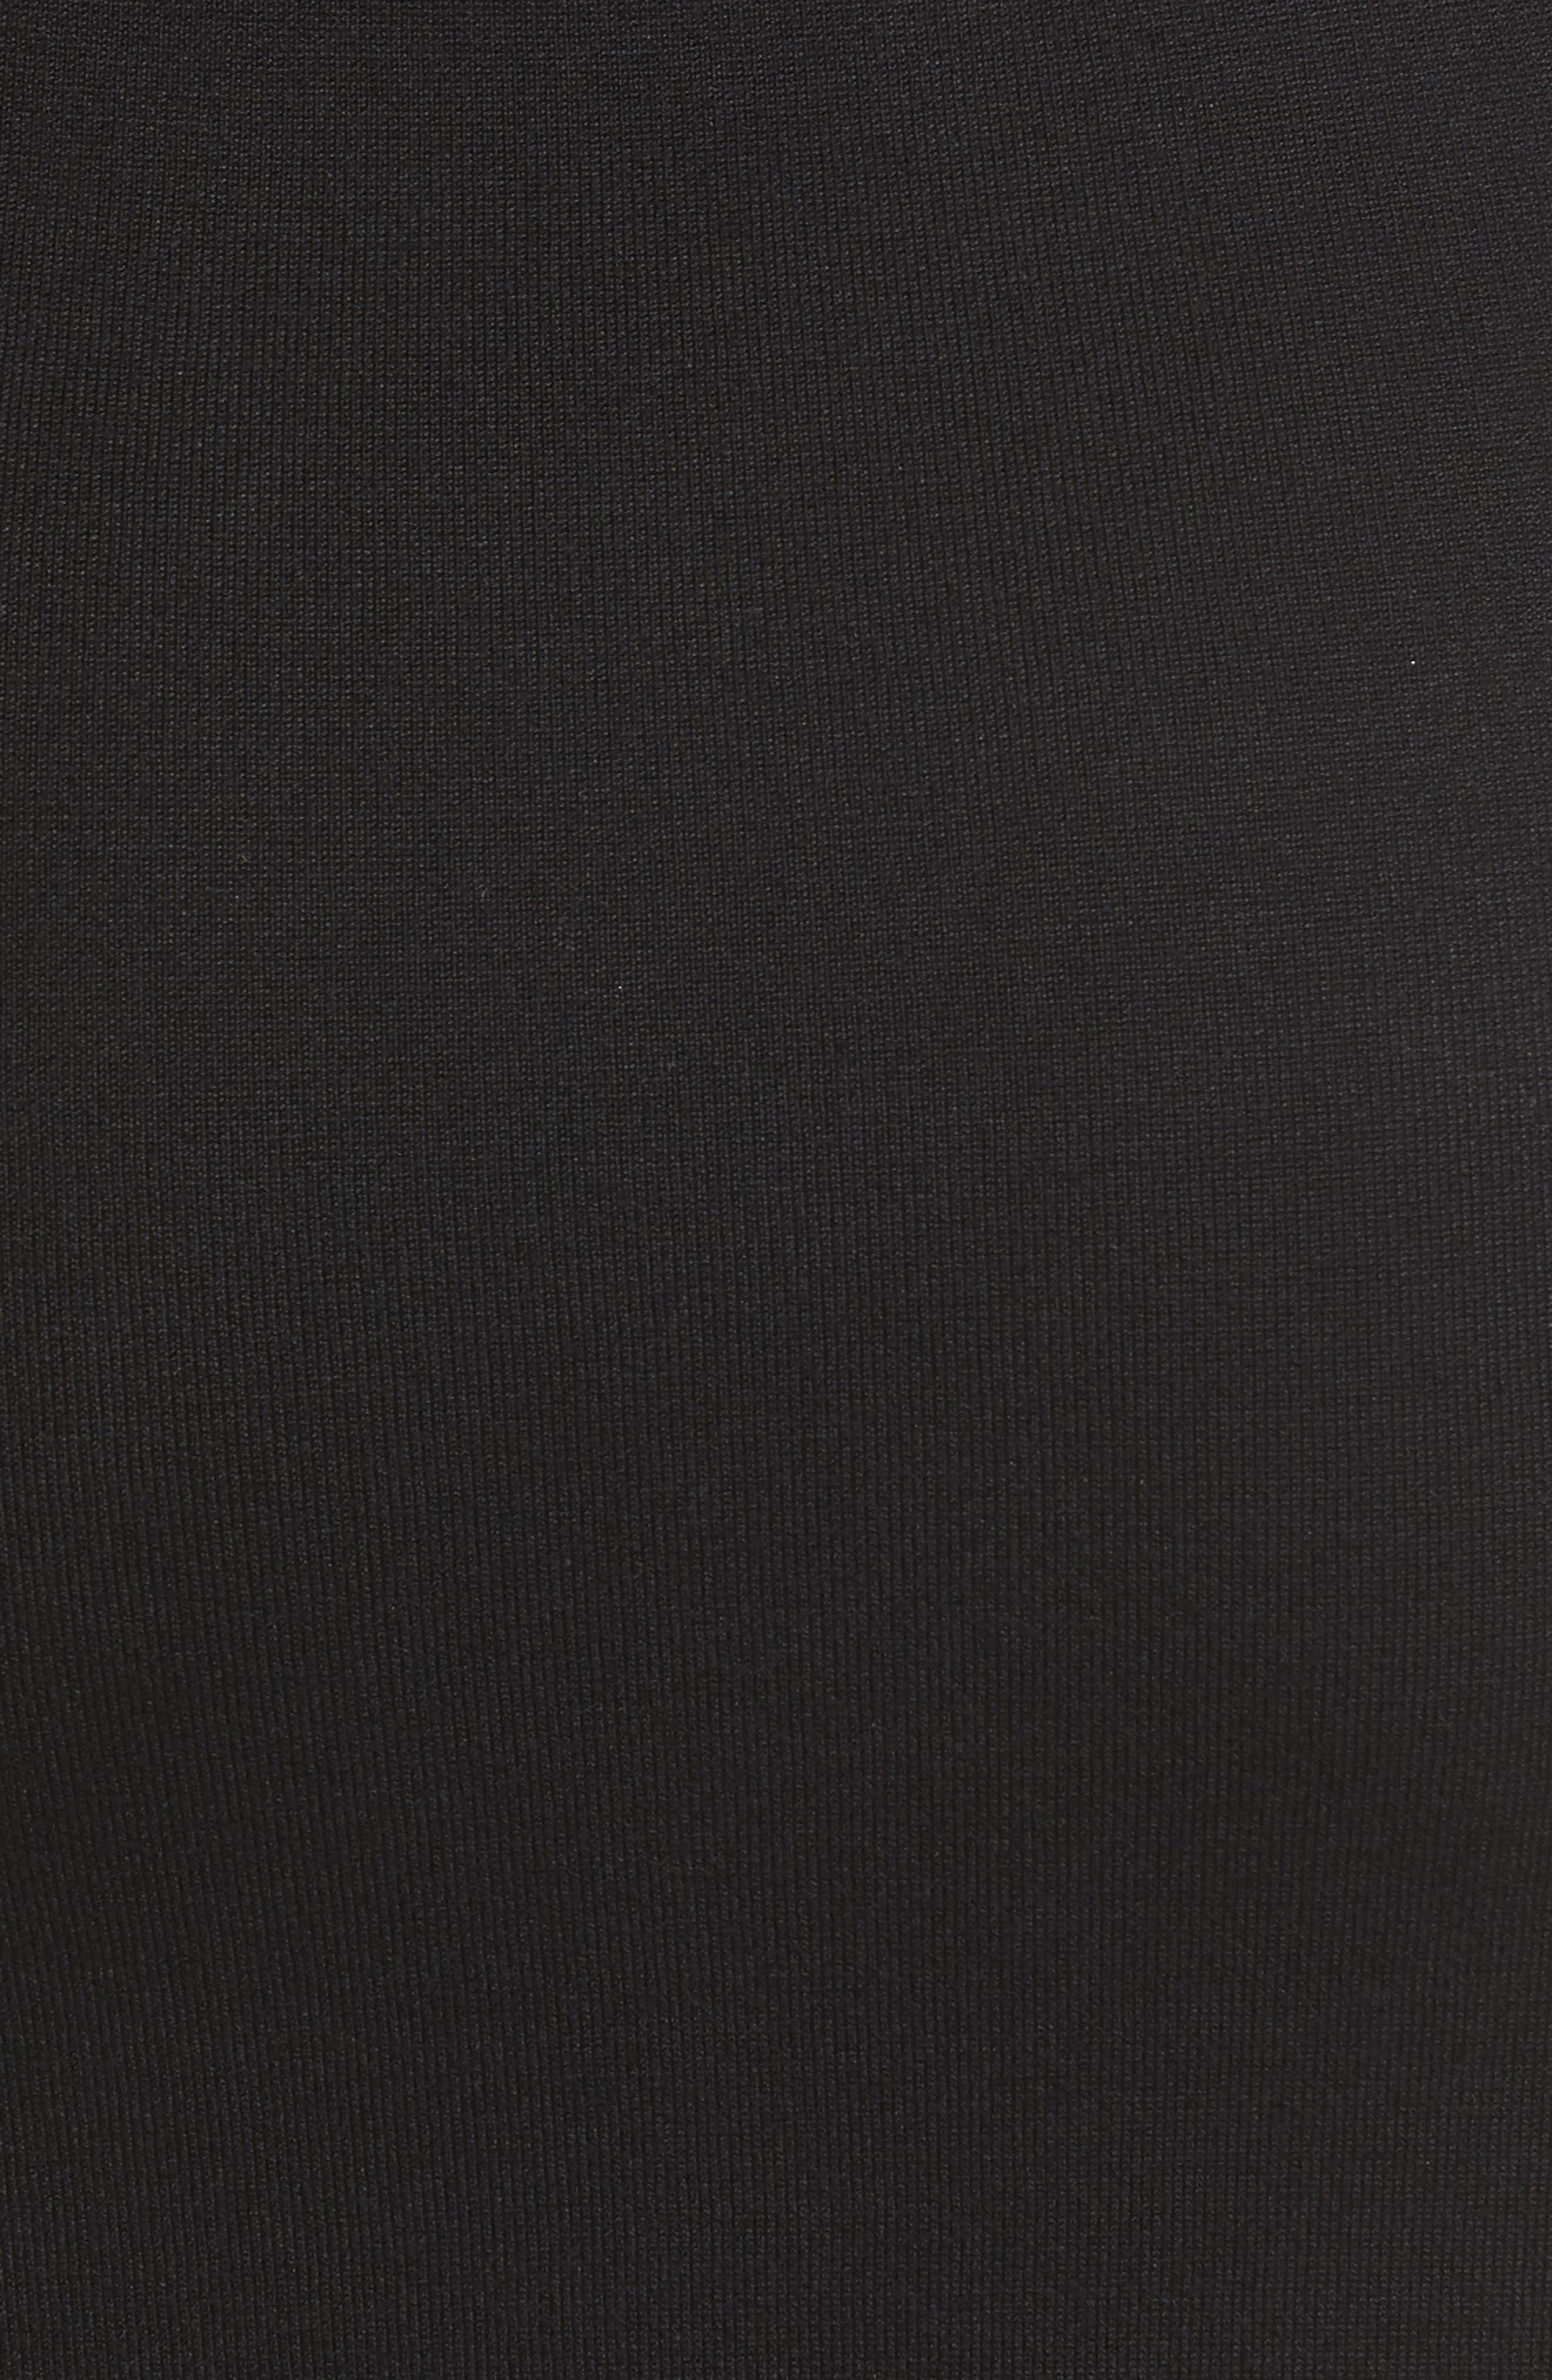 Elbow Sleeve Sweater Dress,                             Alternate thumbnail 5, color,                             Black